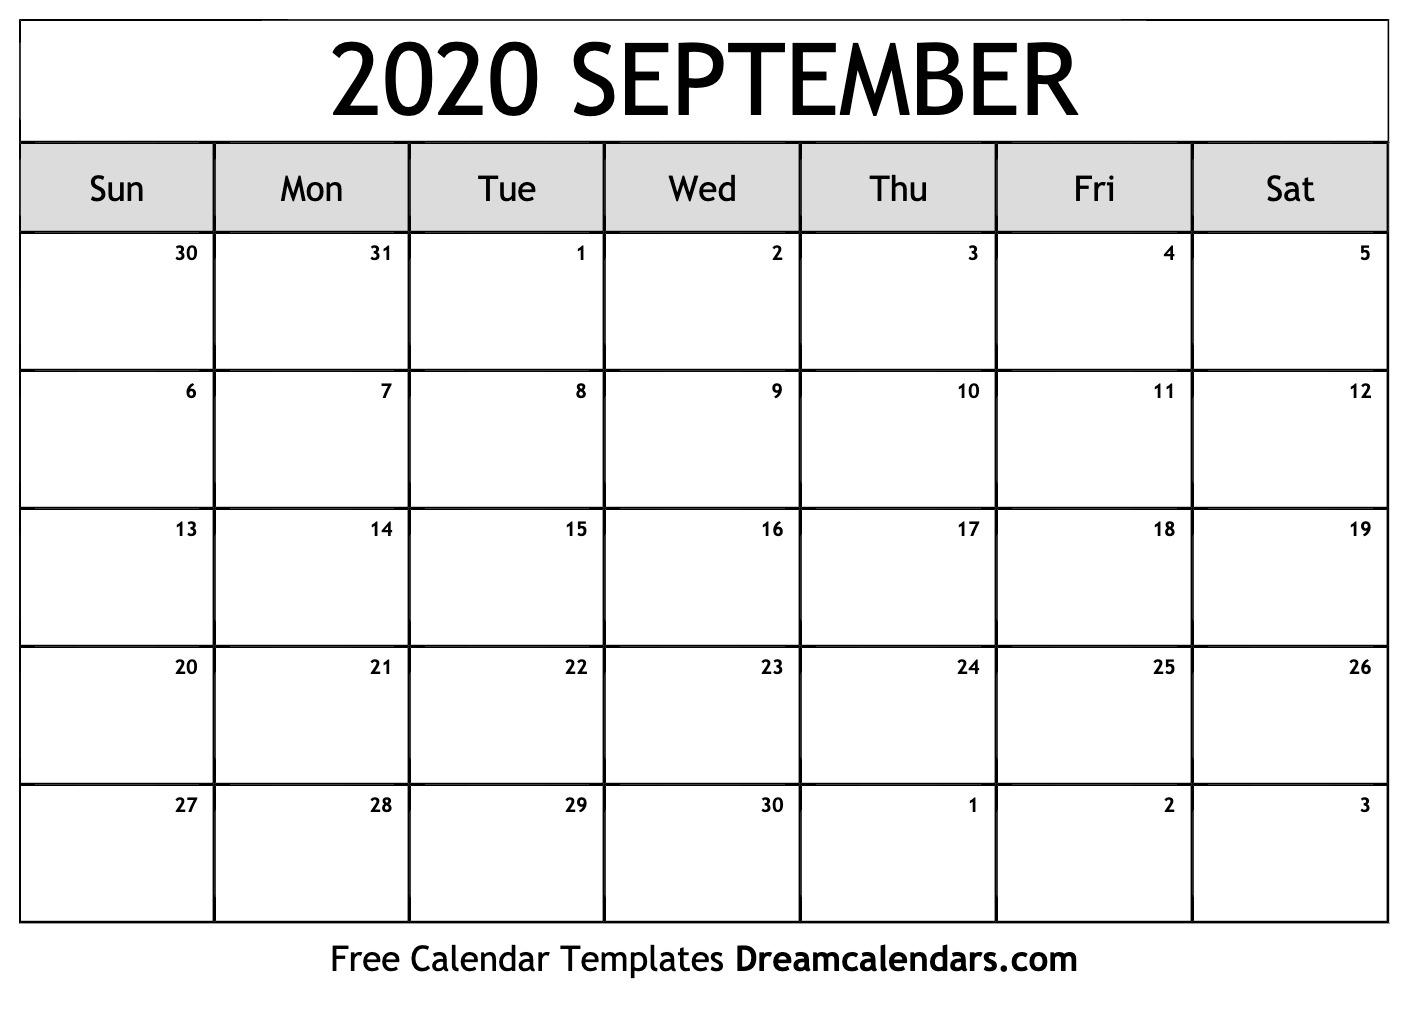 Free Blank September 2020 Printable Calendar throughout Kalendar Kuda September 2020